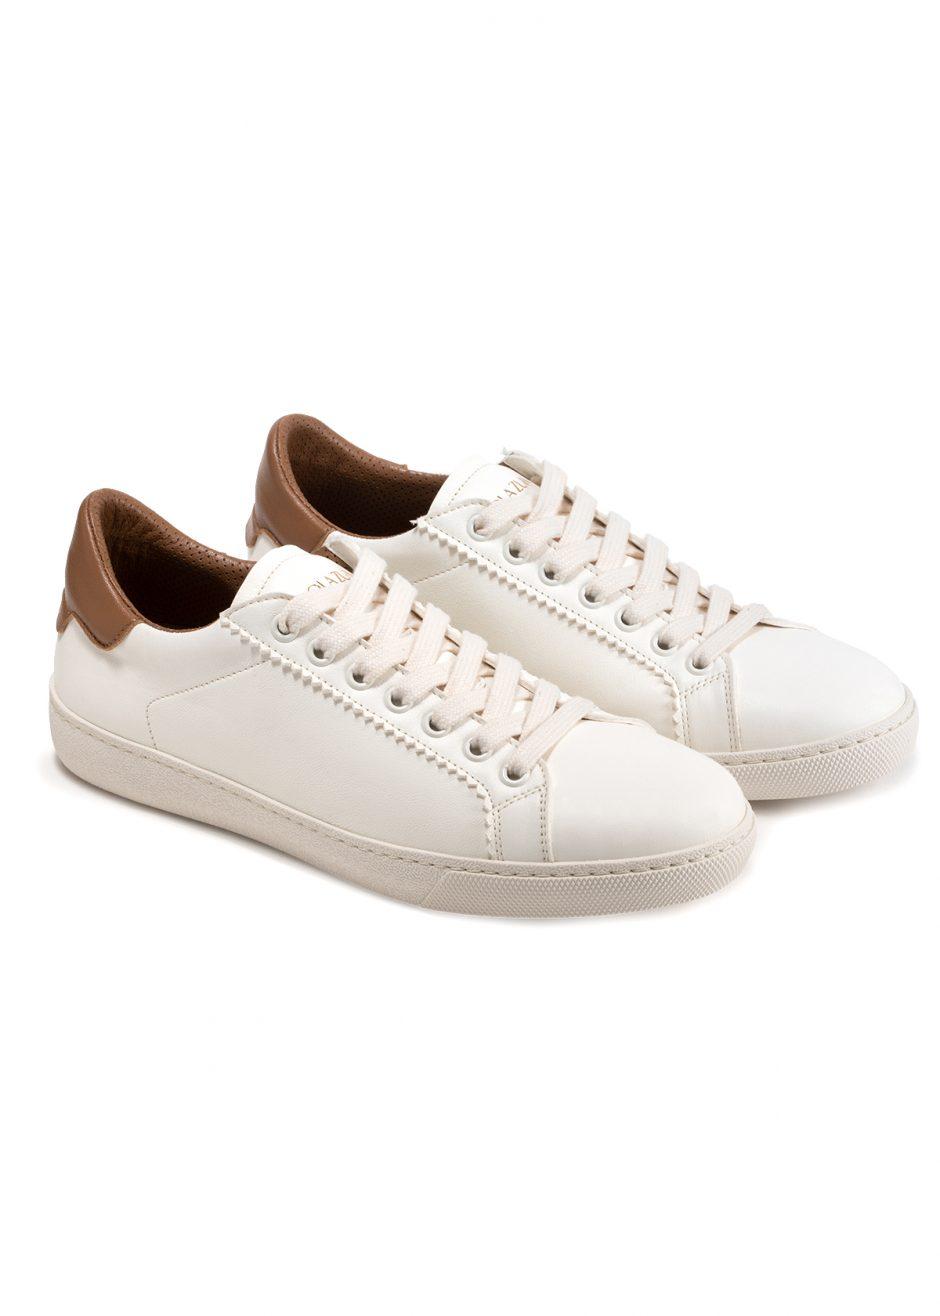 Jackie – Sneakers in pelle di capretto milk